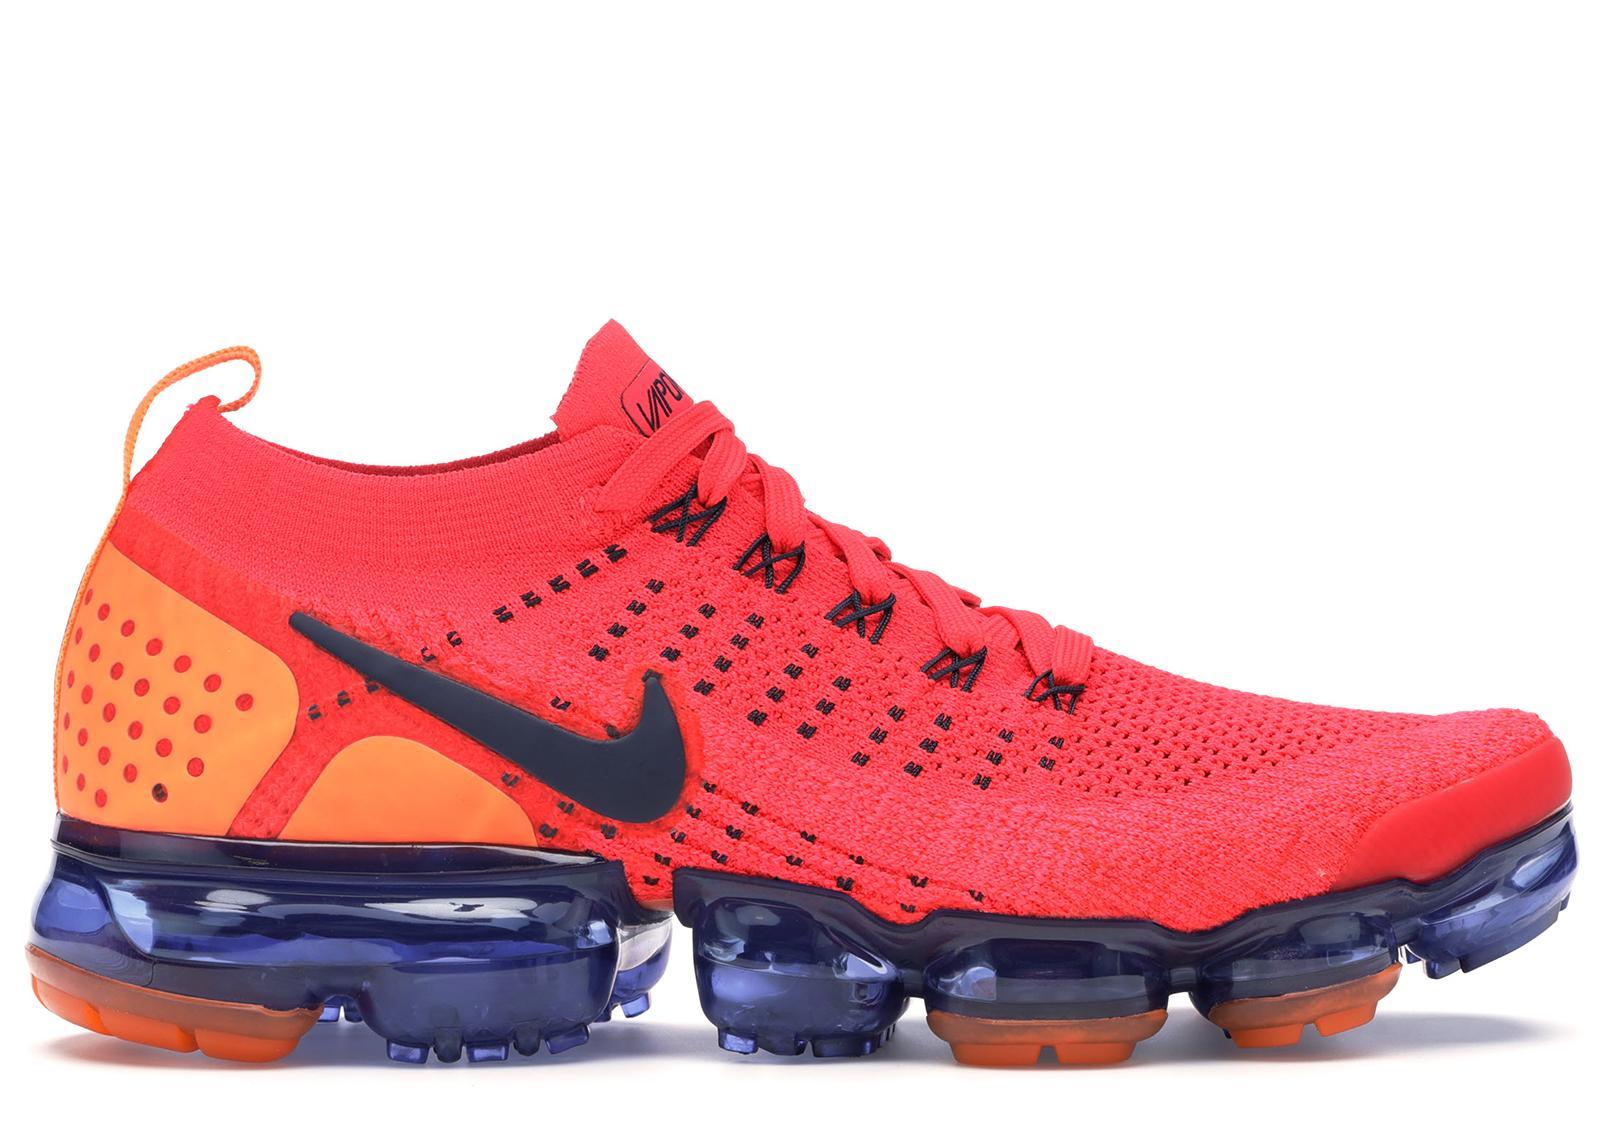 Nike Air Vapormax 2 Spiderman in Red